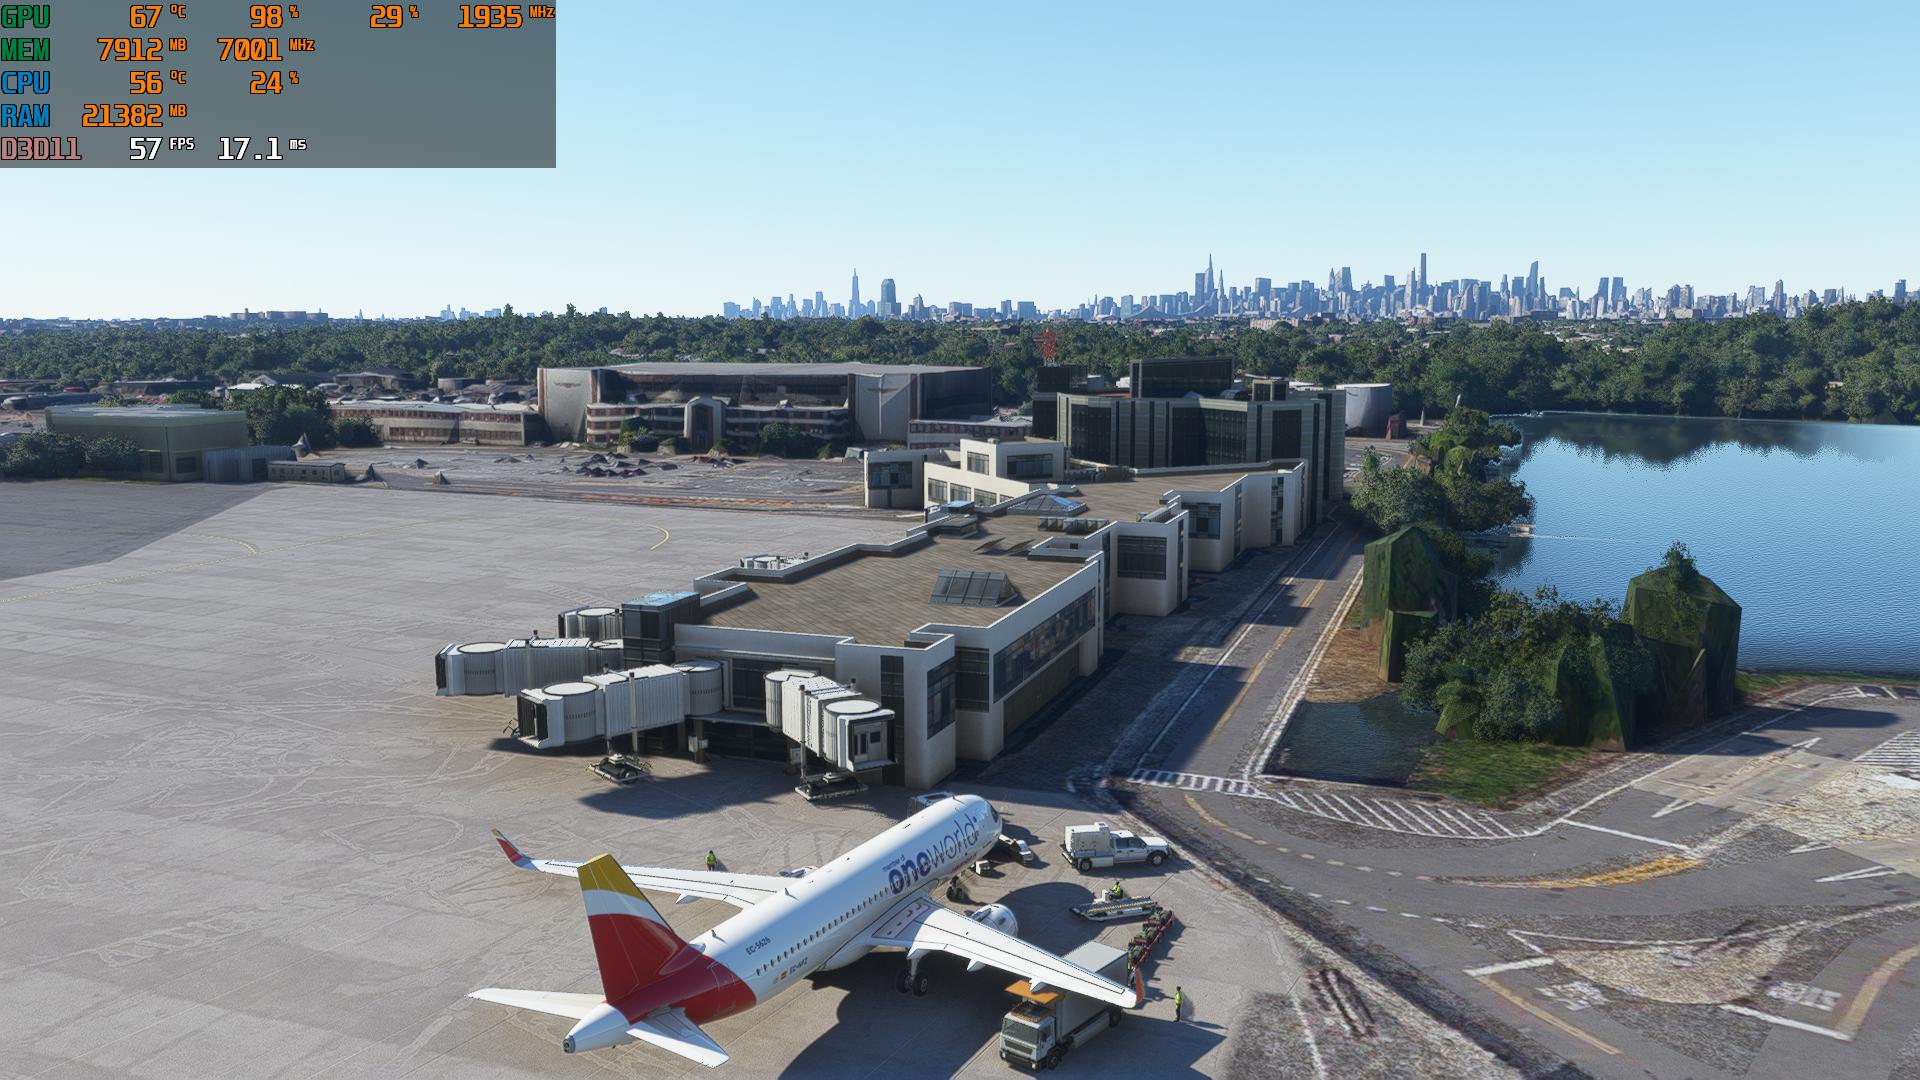 Microsoft-Flight-Simulator-Screenshot-2020-10-31-17-18-44-51